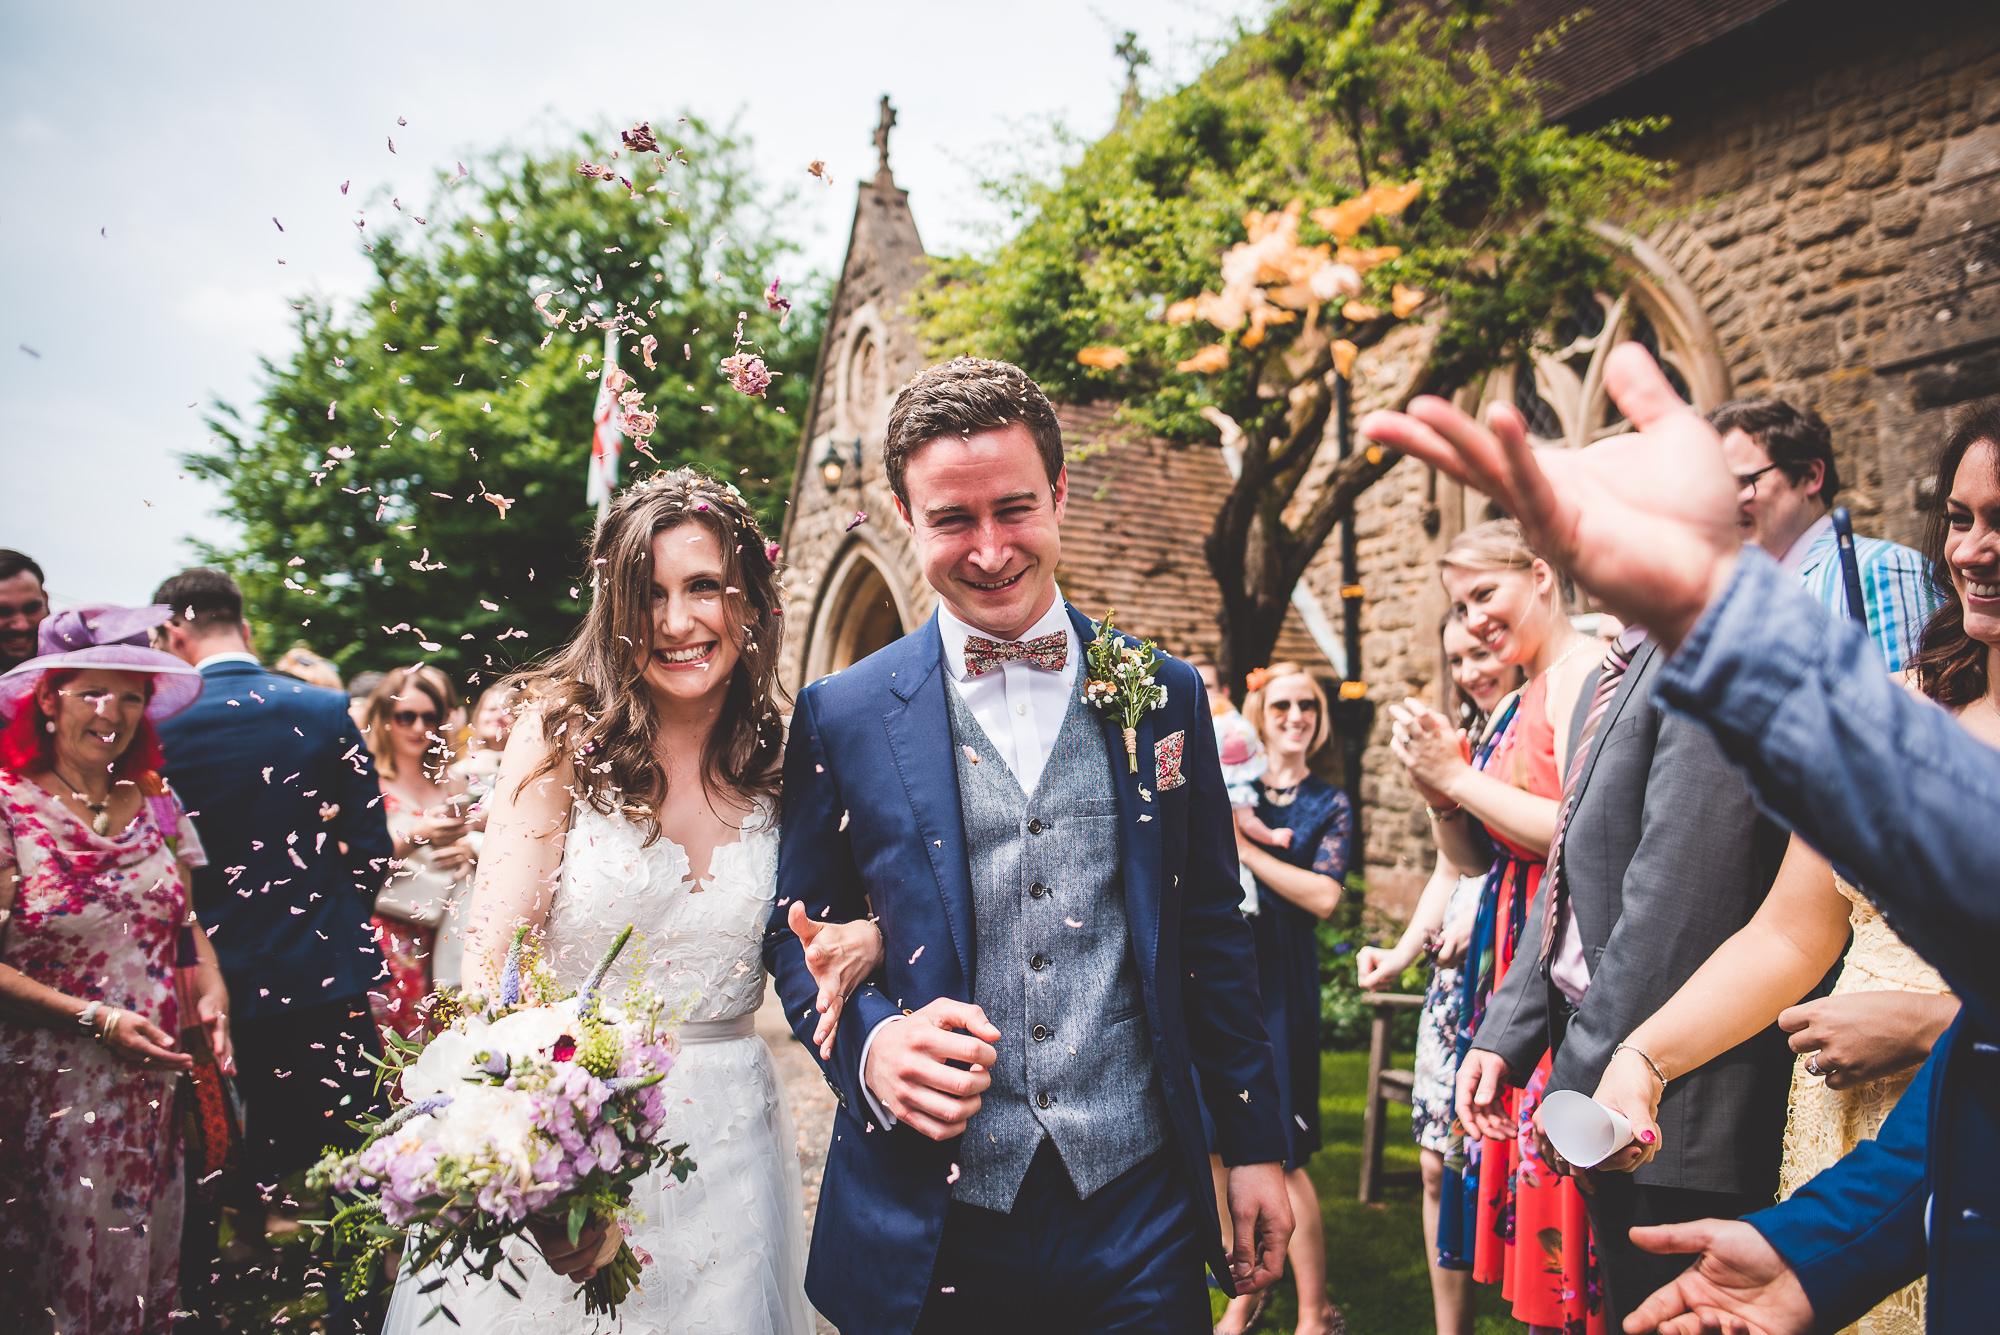 Veils & Bales Wedding Photography | Charlie & Steve SCSS 084